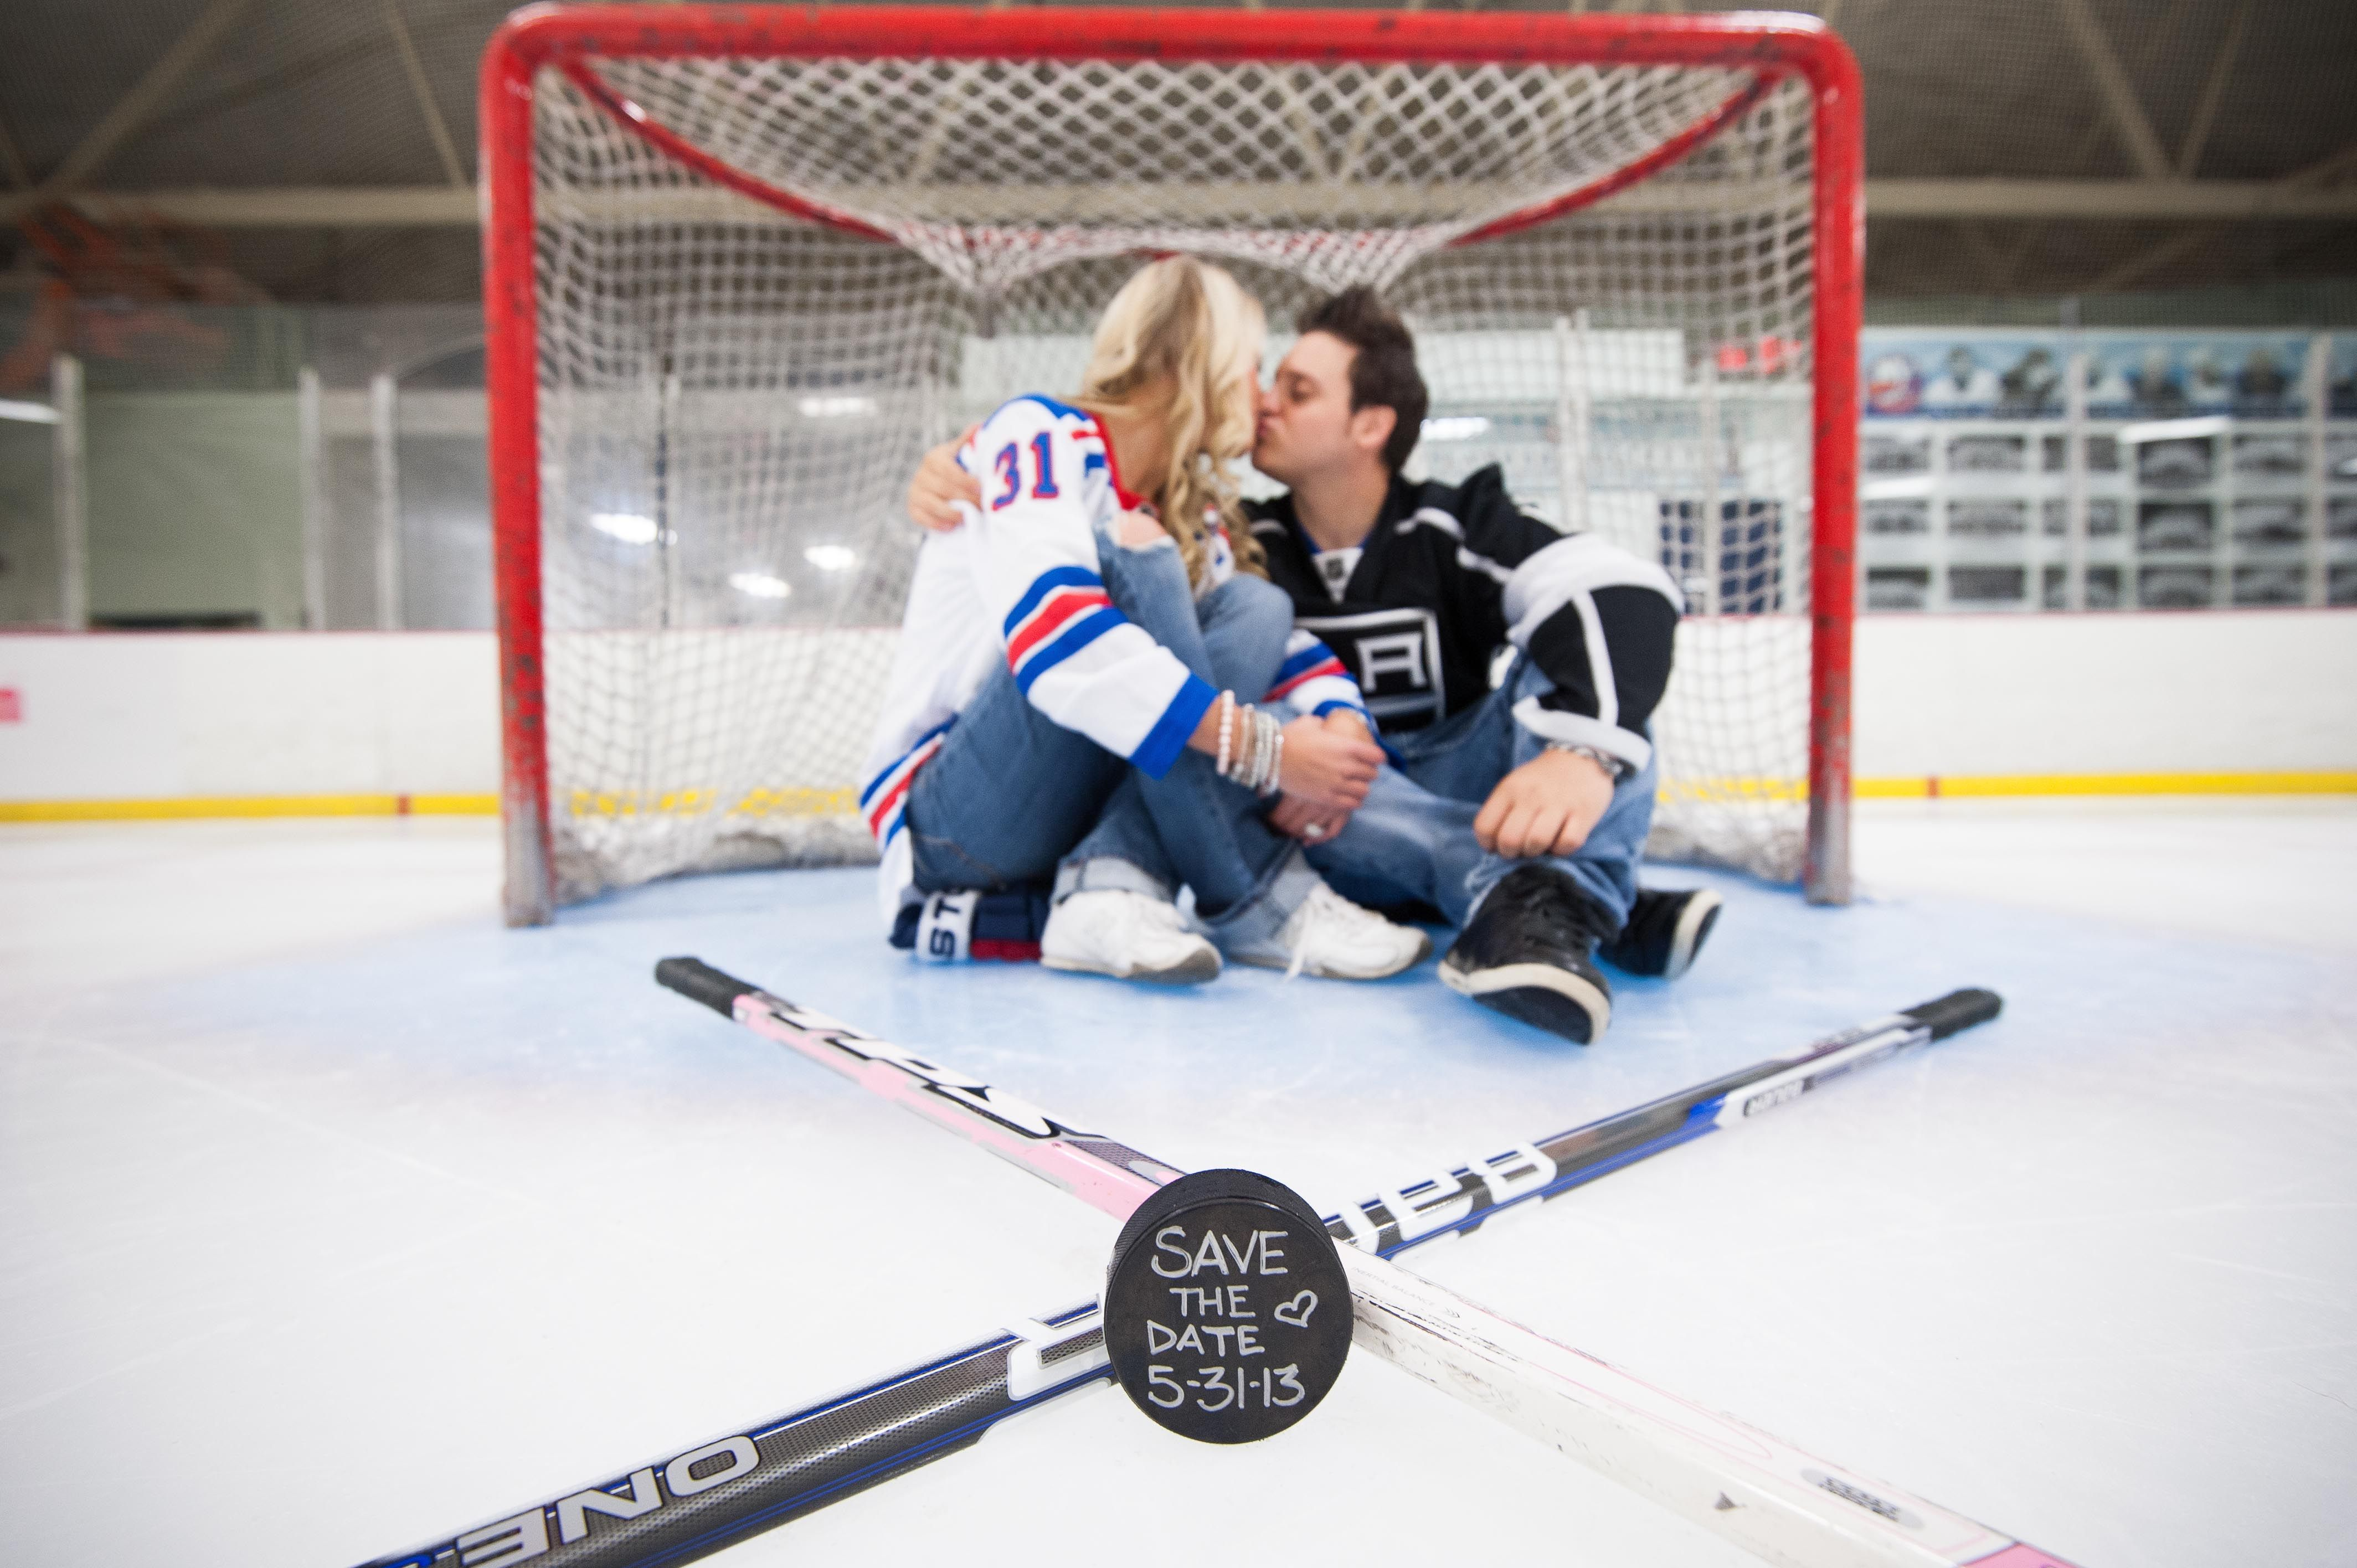 Hockey Love My Engagement Shoot Hockey Engagement Photos Hockey Wedding Hockey Wedding Photos